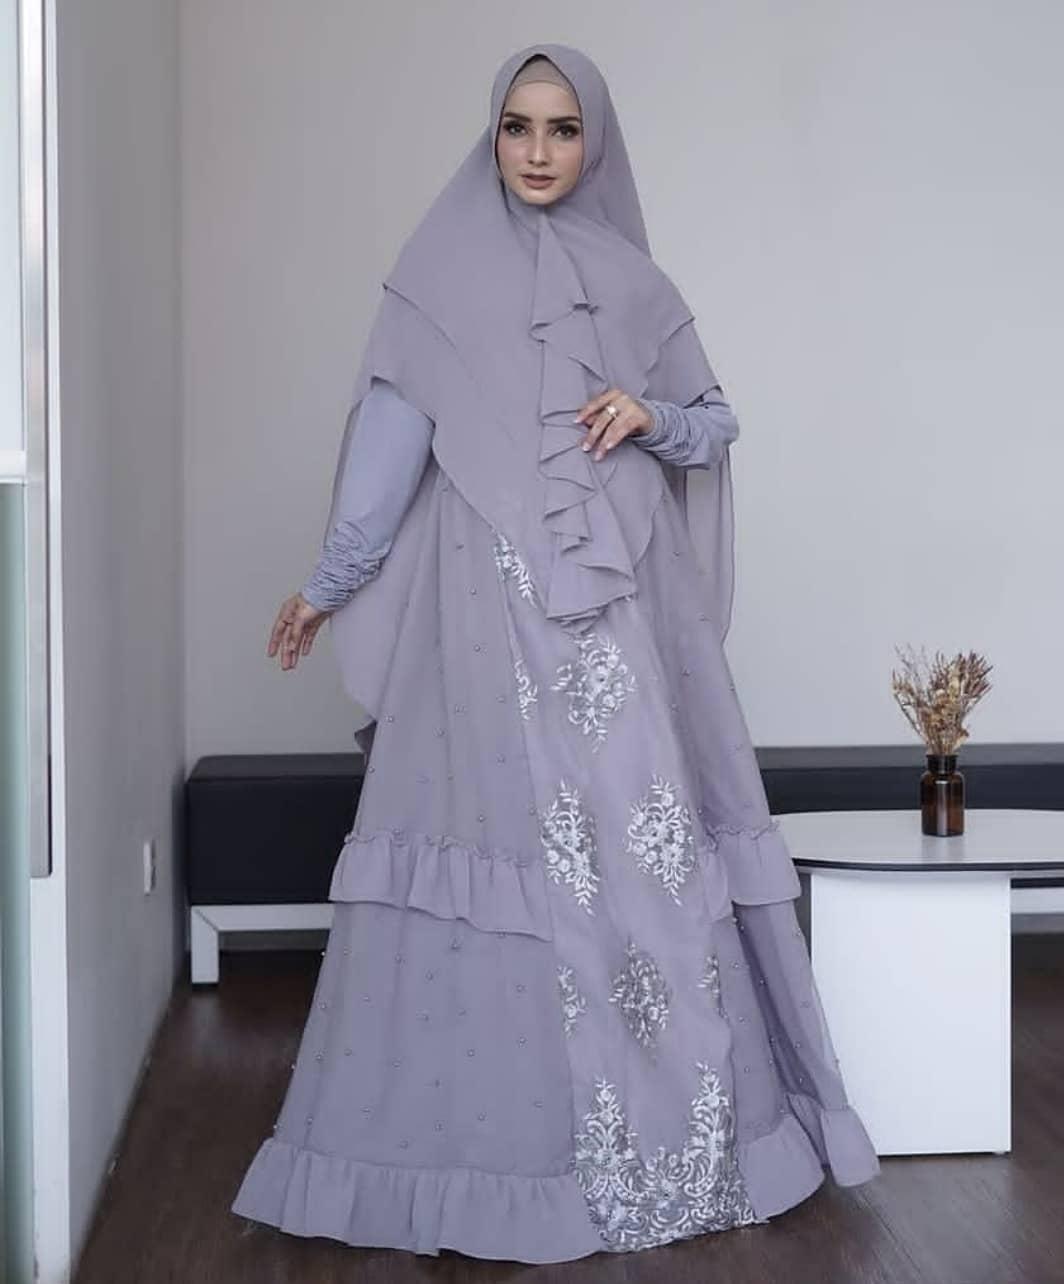 Gamis Syari Latifah syari bu Gallery Syarifah ORIGINAL - Gamis brokat